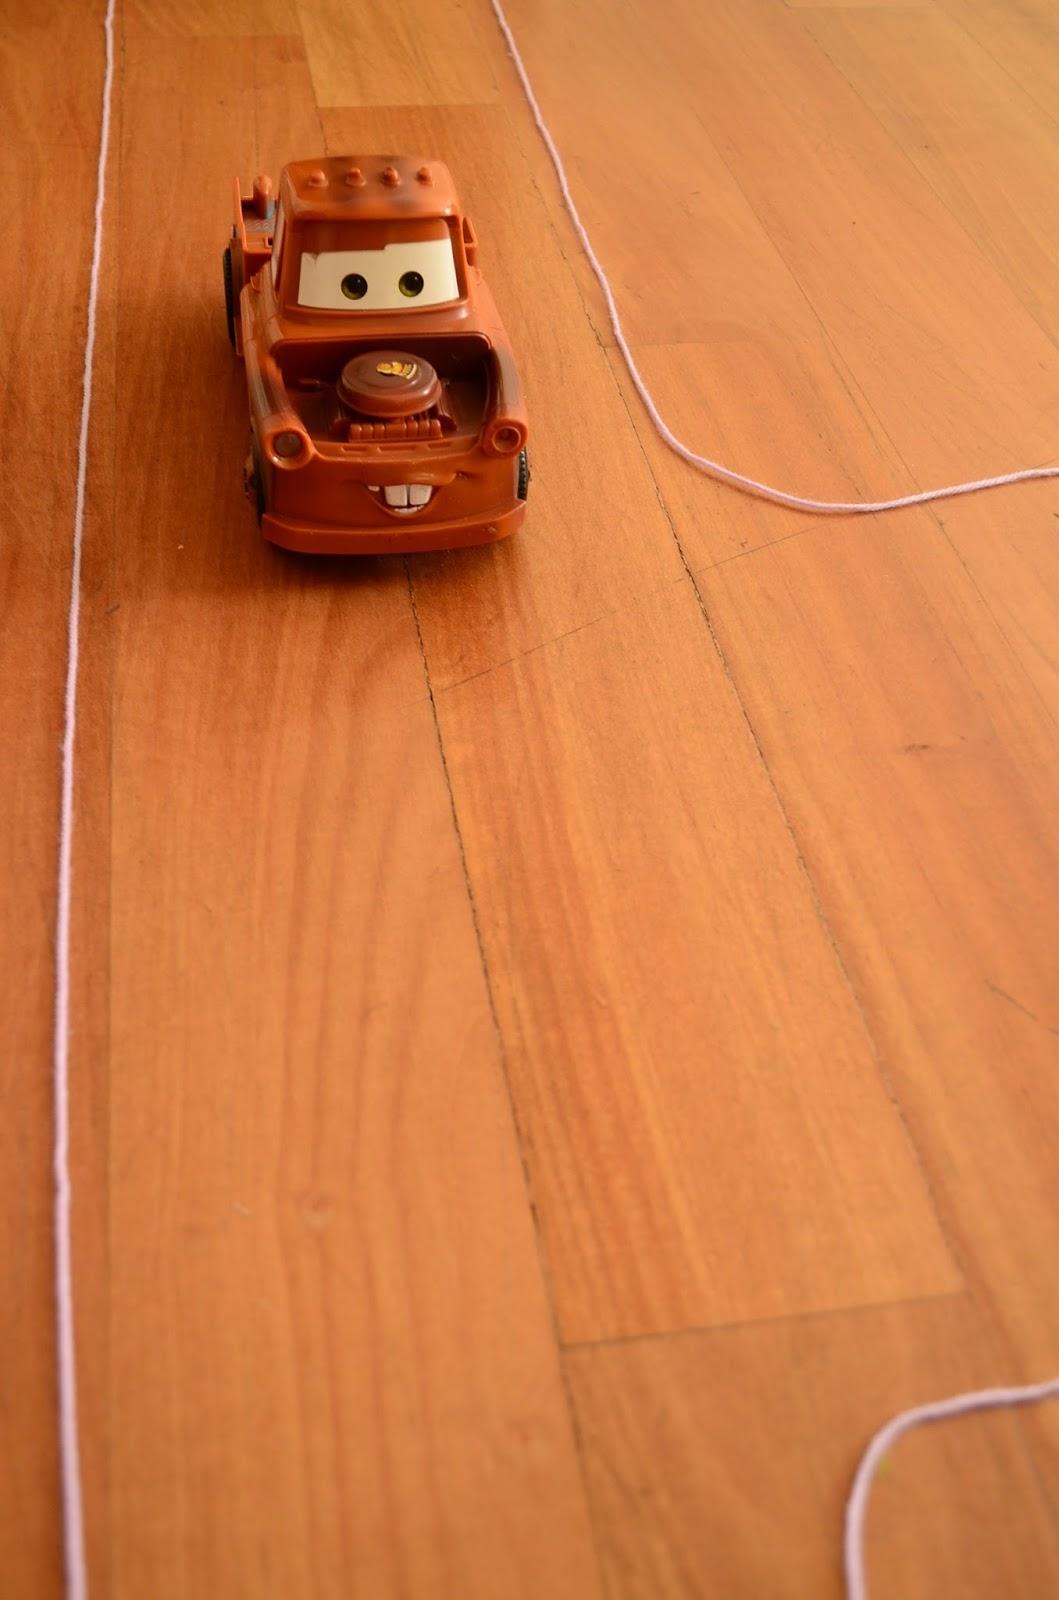 The Practical Mom: Yarn Toy Car Tracks (Practical Mondays #11)